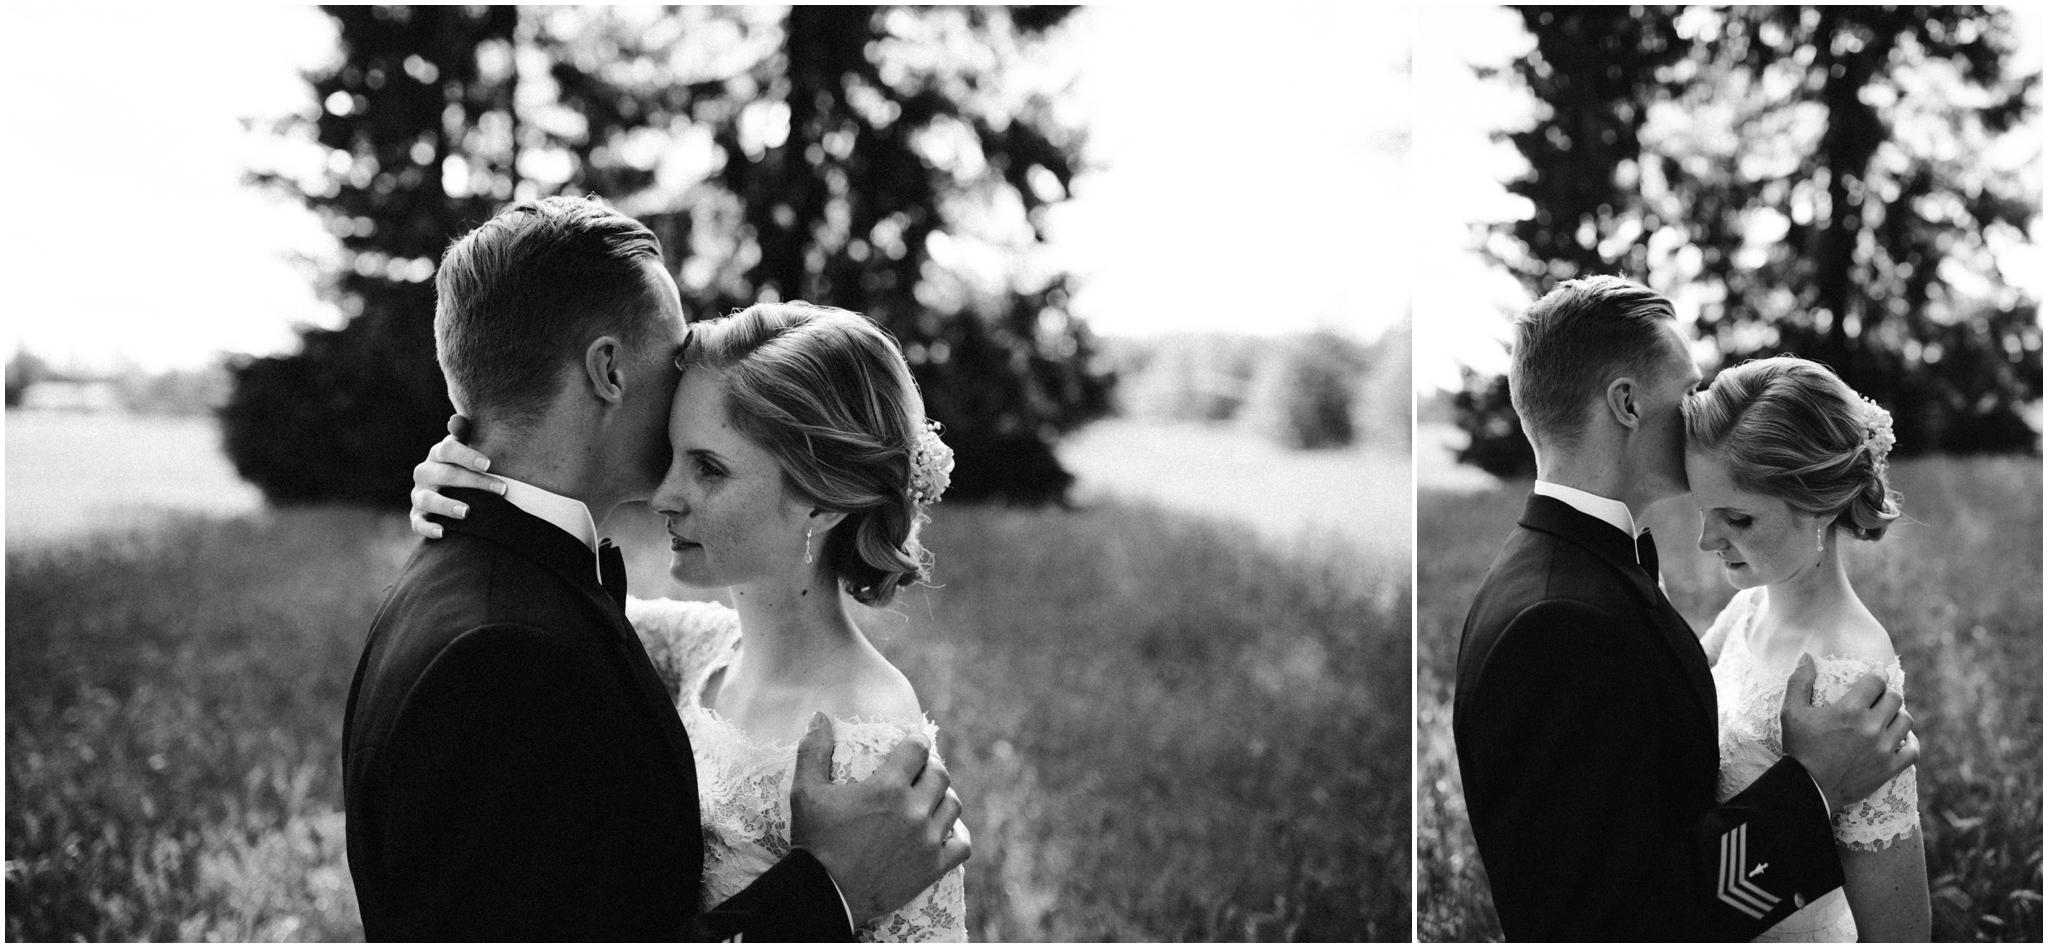 Pinja + Marko -- Patrick Karkkolainen Wedding Photographer-80.jpg